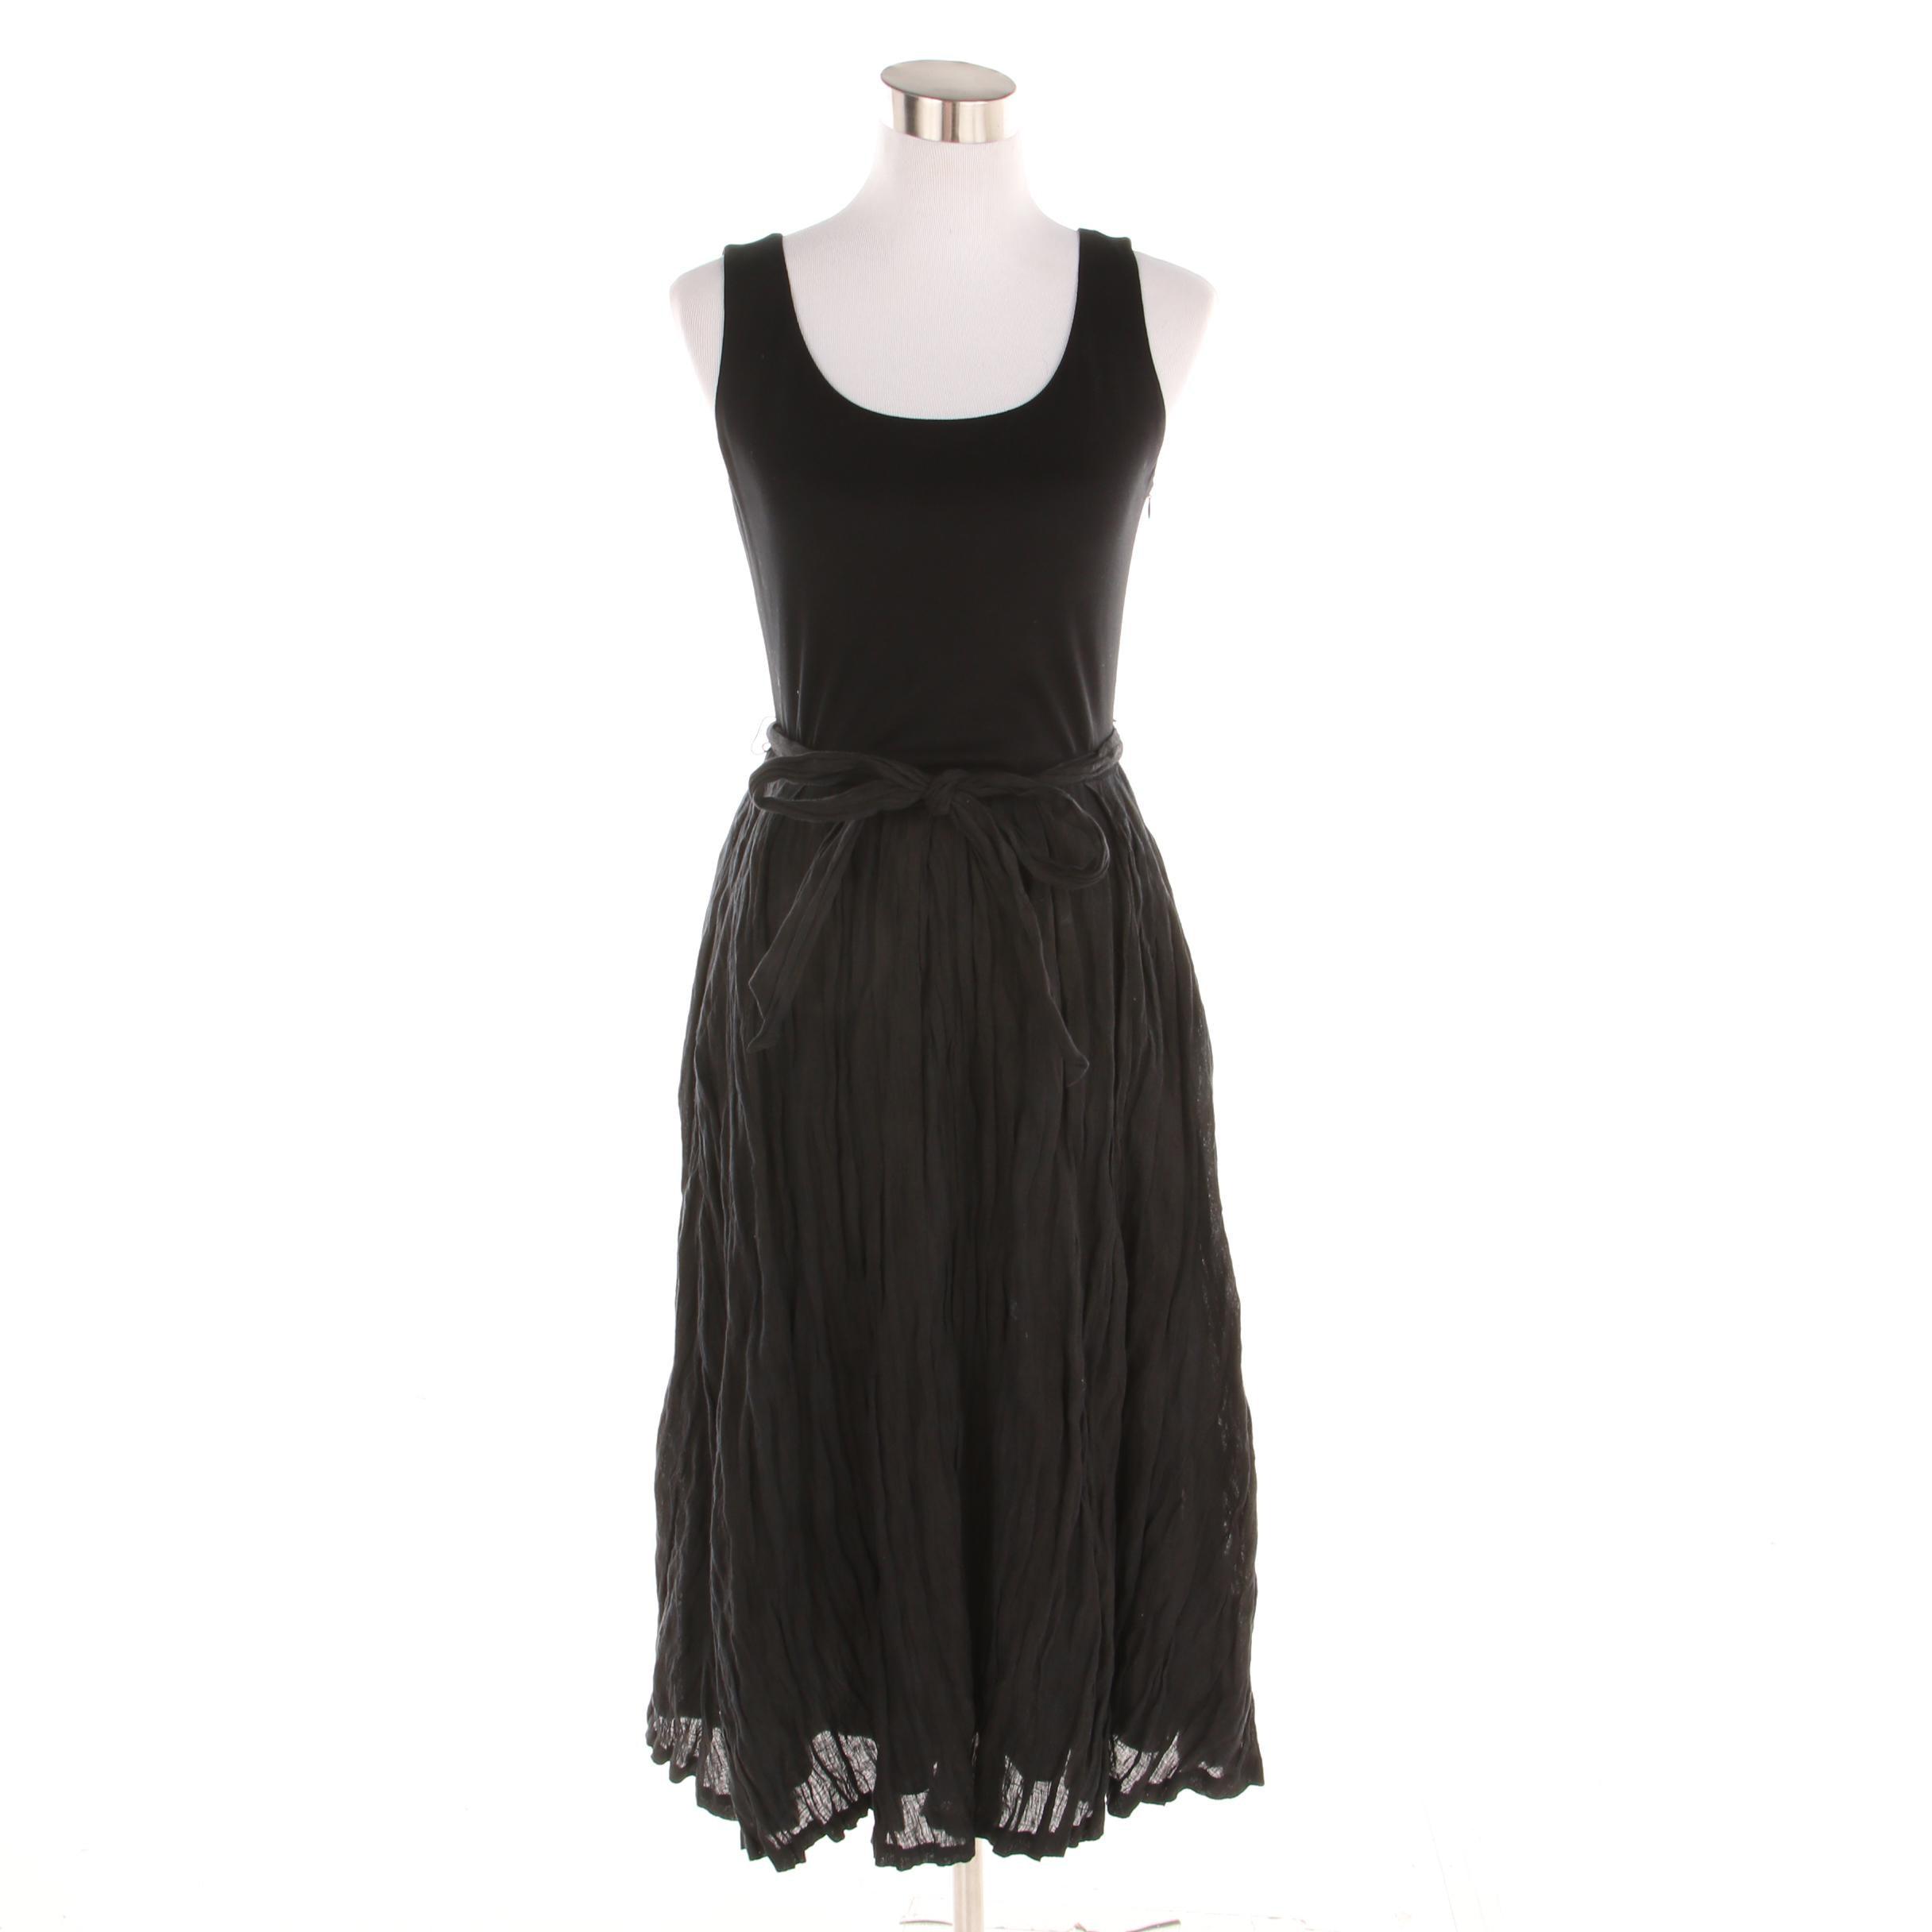 Lafayette 148 Black Linen and Cotton Blend Sleeveless Dress